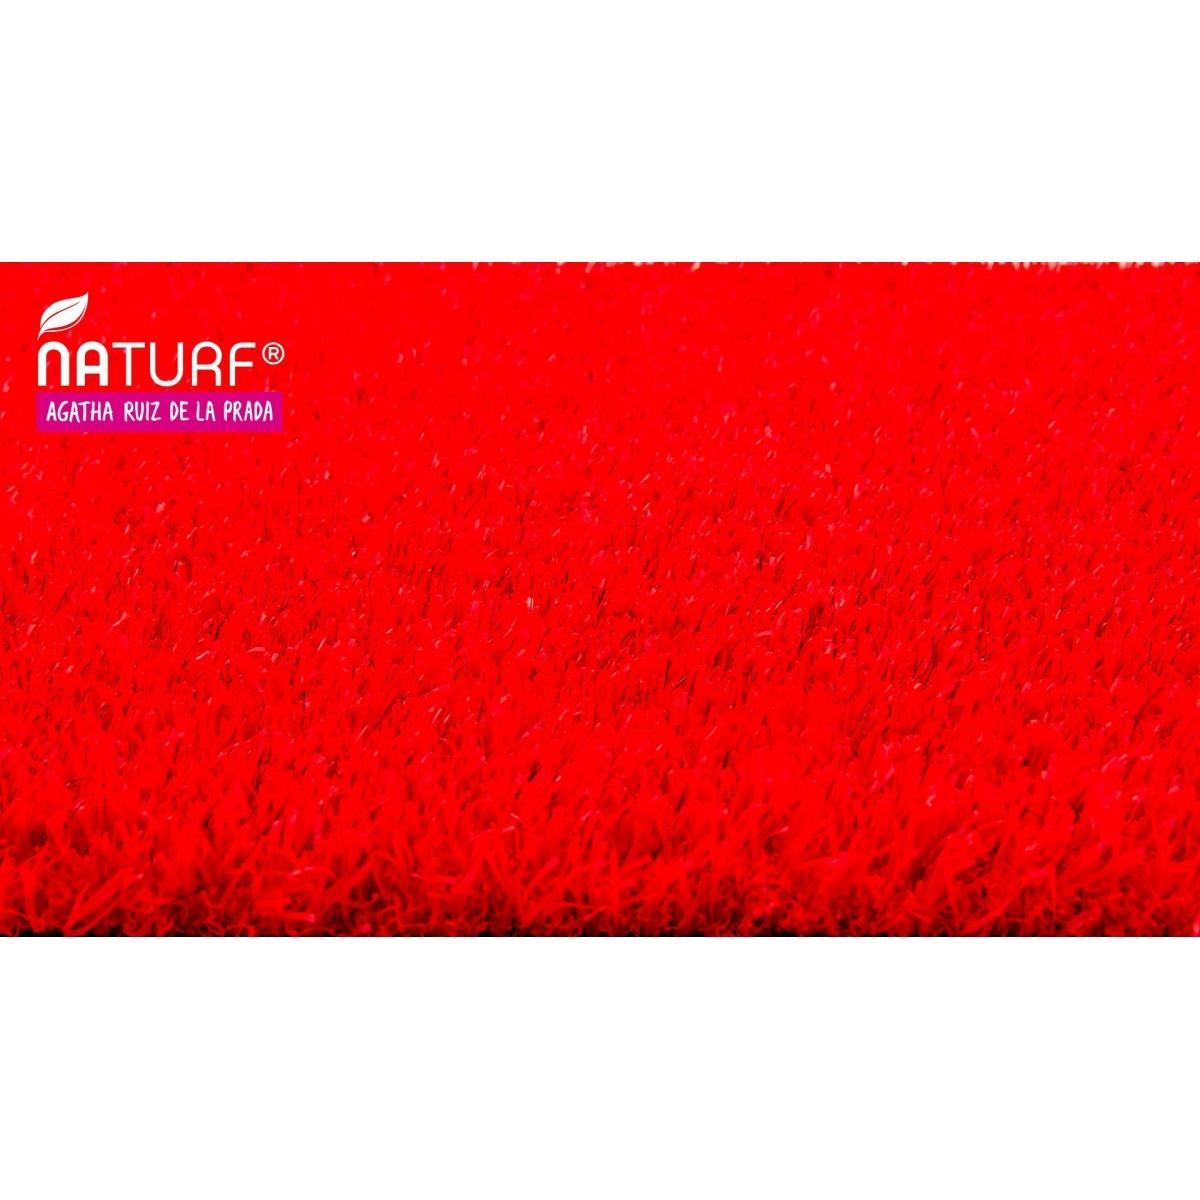 Cesped artificial Rojo Serie Agatha Naturf